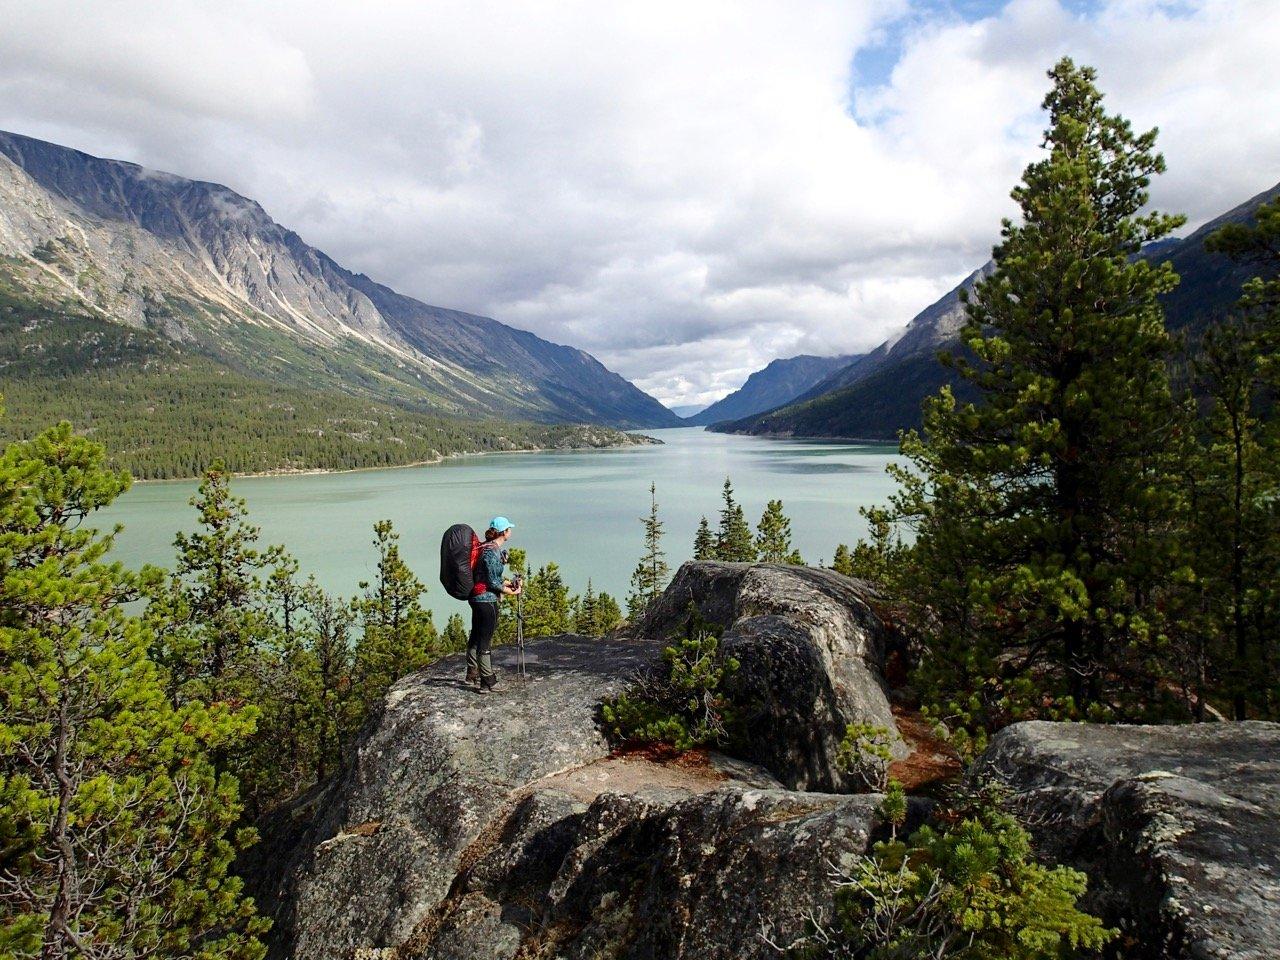 Lake Bennett on the Chilkoot Trail